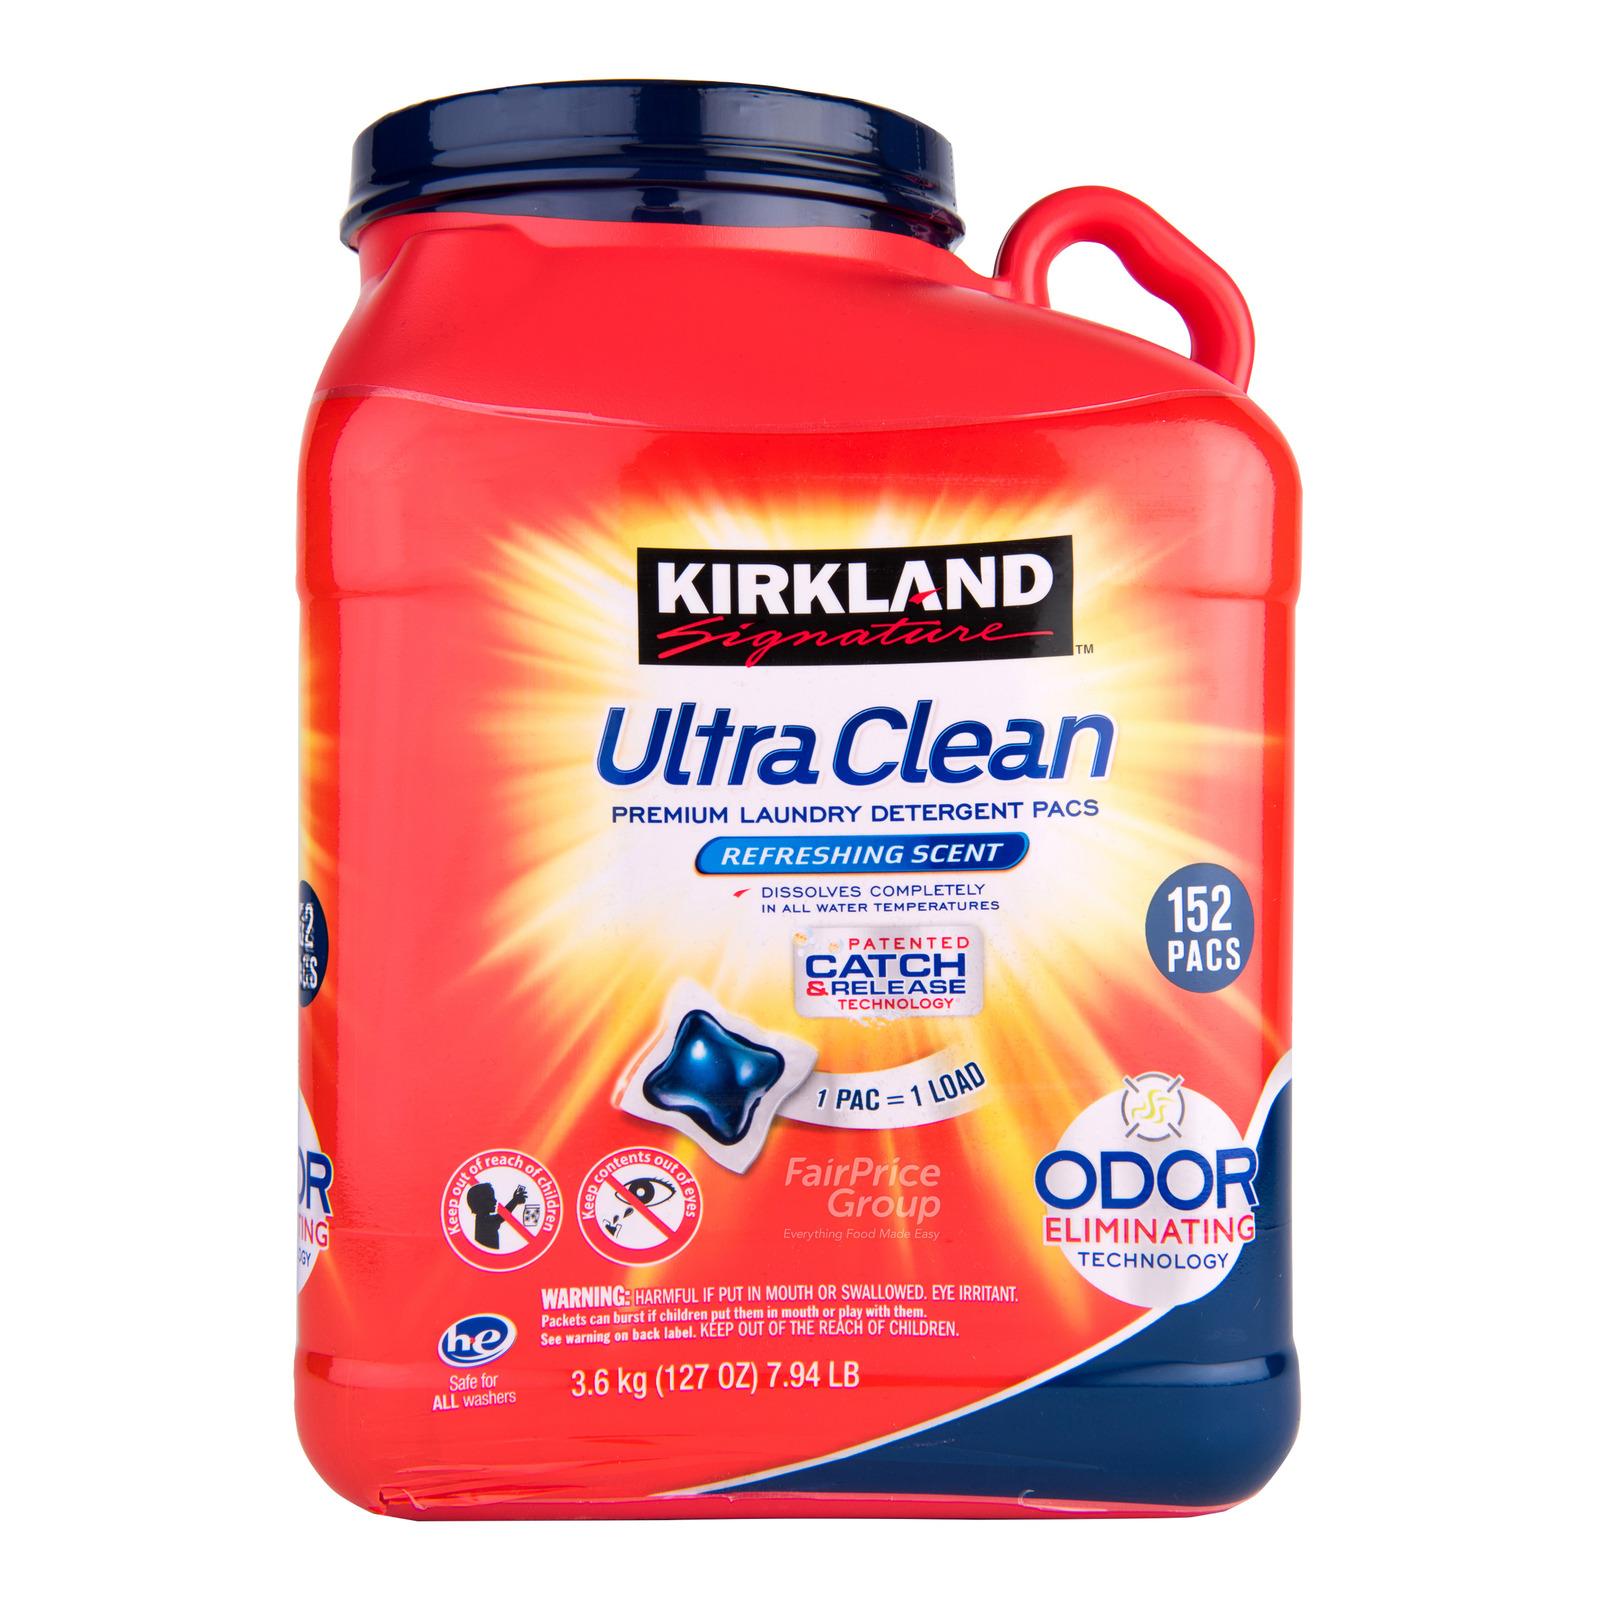 Kirkland Signature Premium Laundry Detergent Pacs Ultra